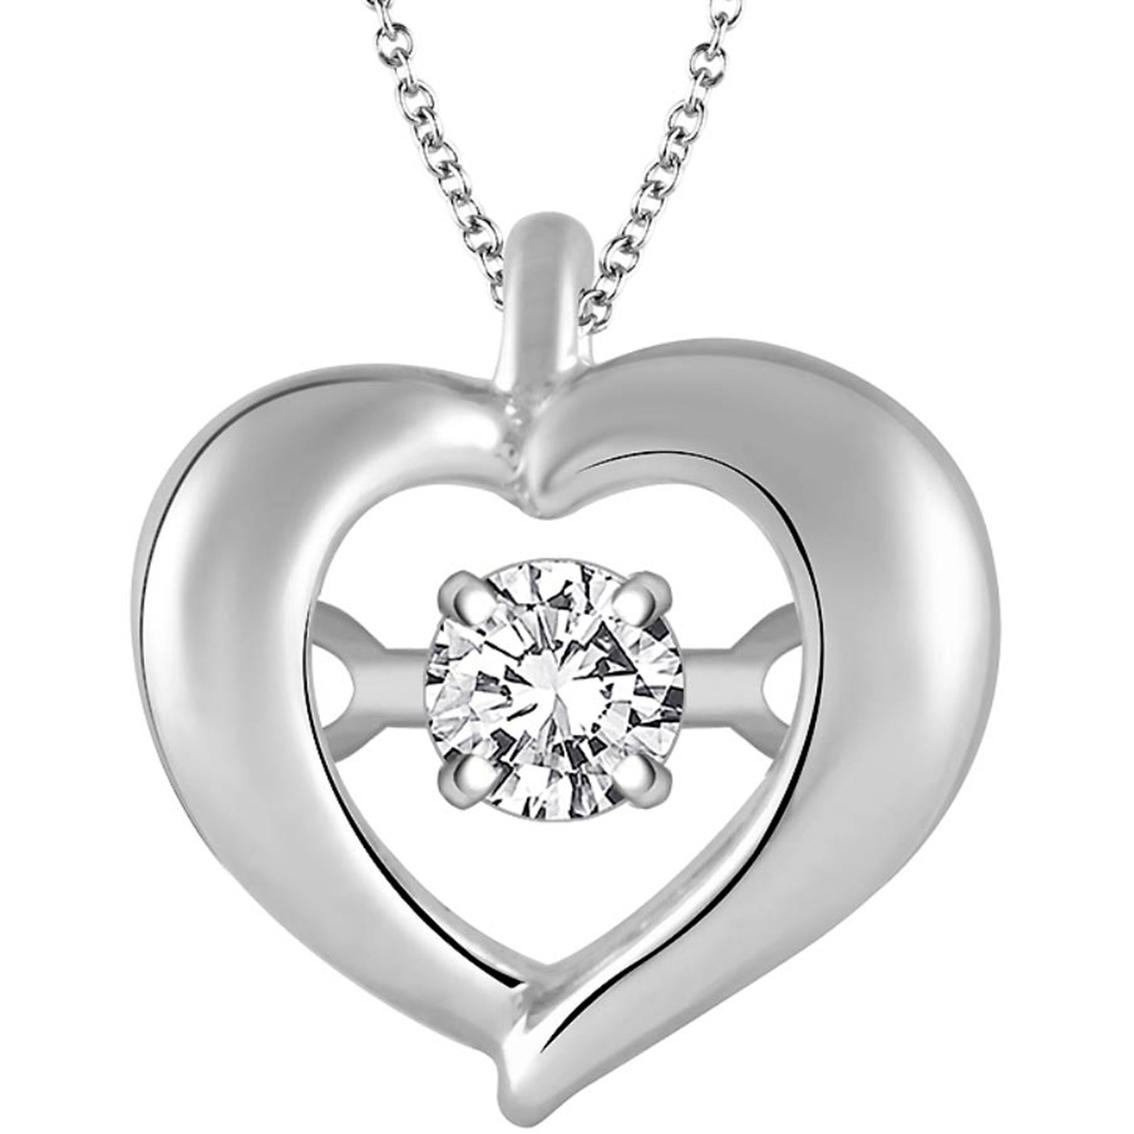 1134x1134 Sterling Silver Dancing Diamond Heart Pendant Diamond Heart